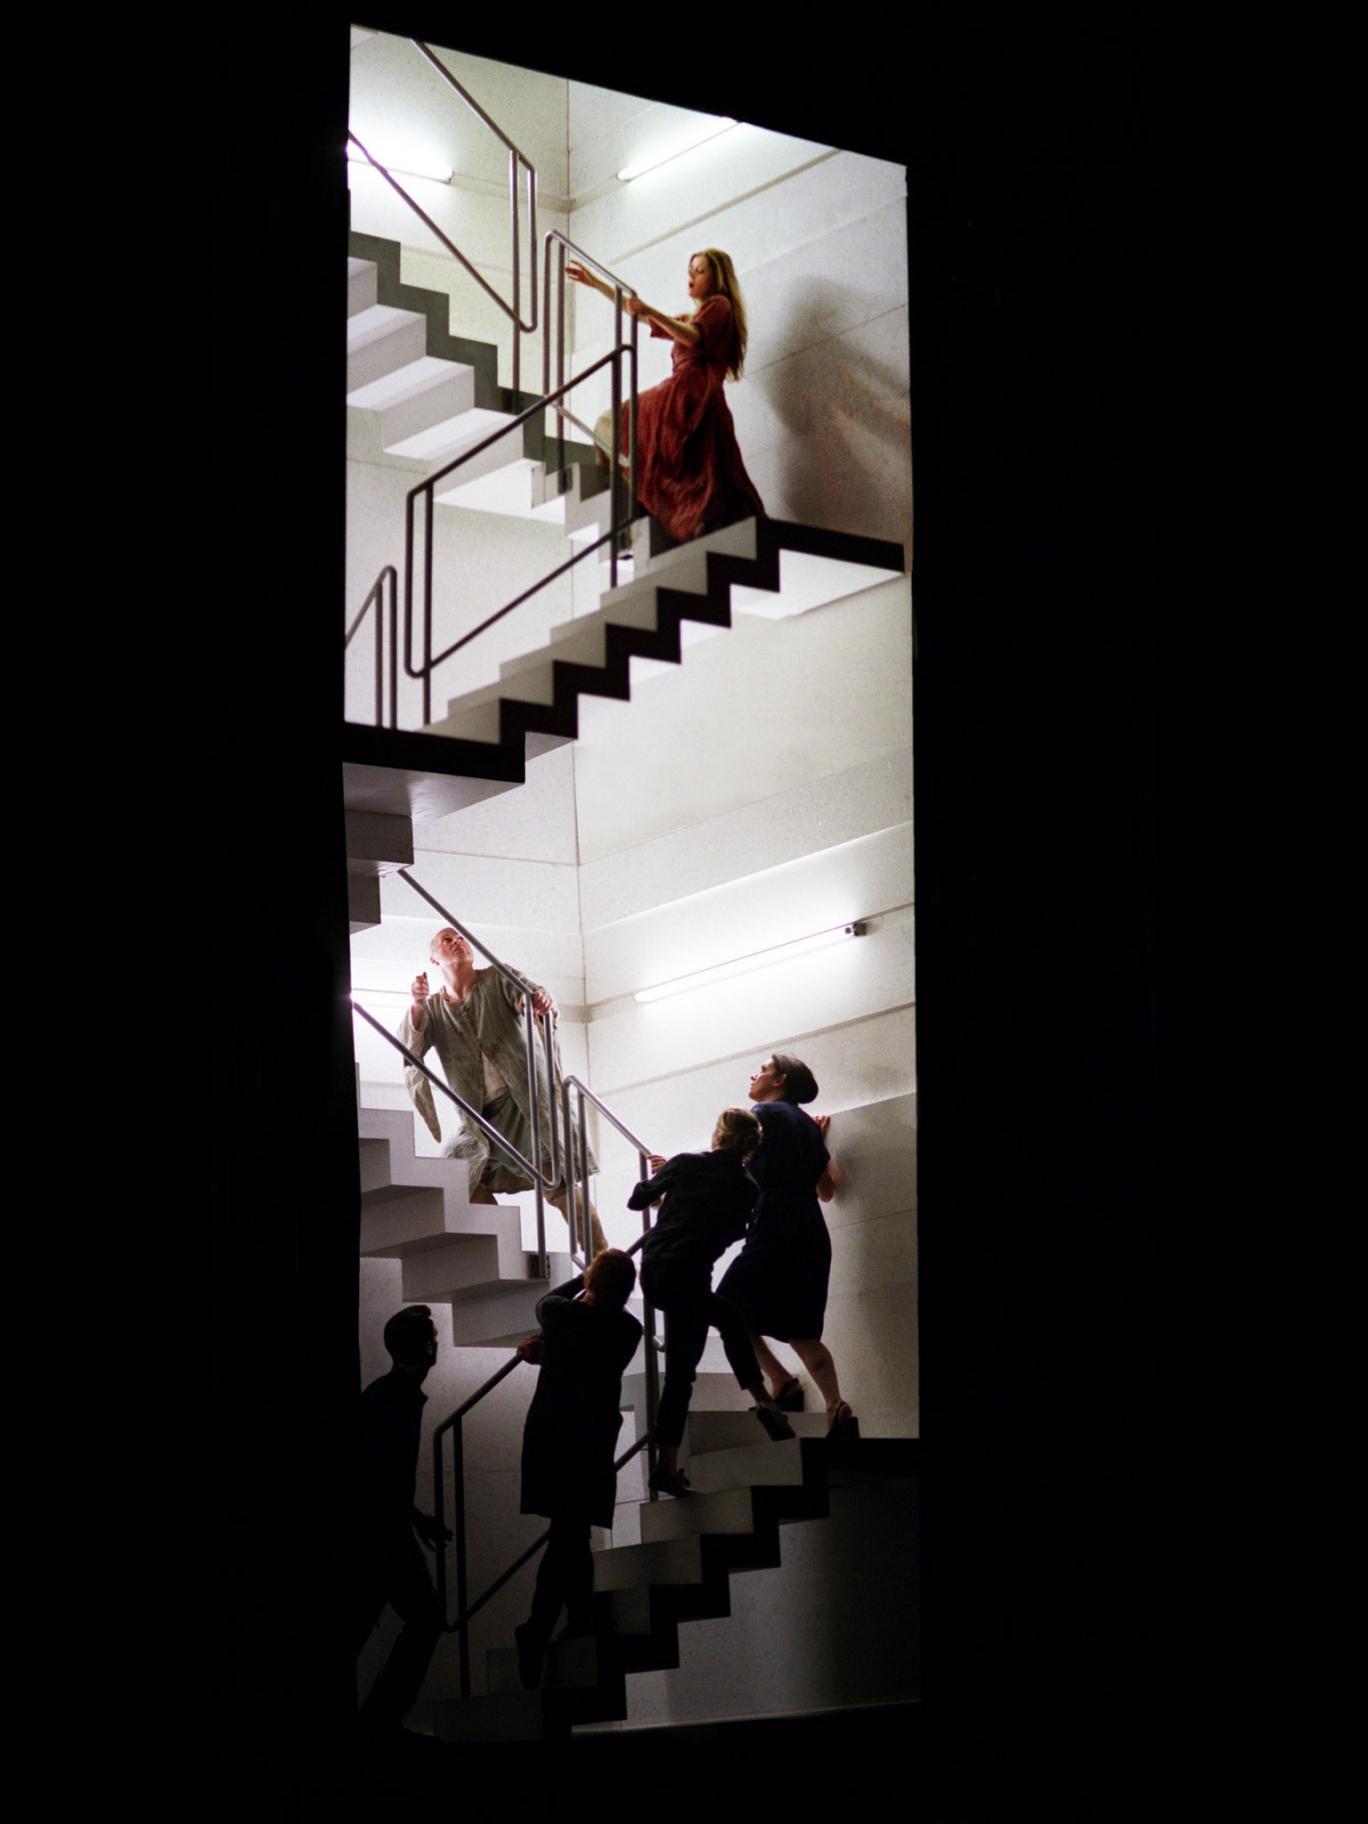 Top notch: Barbara Hannigan as Agnès climbs to her doom